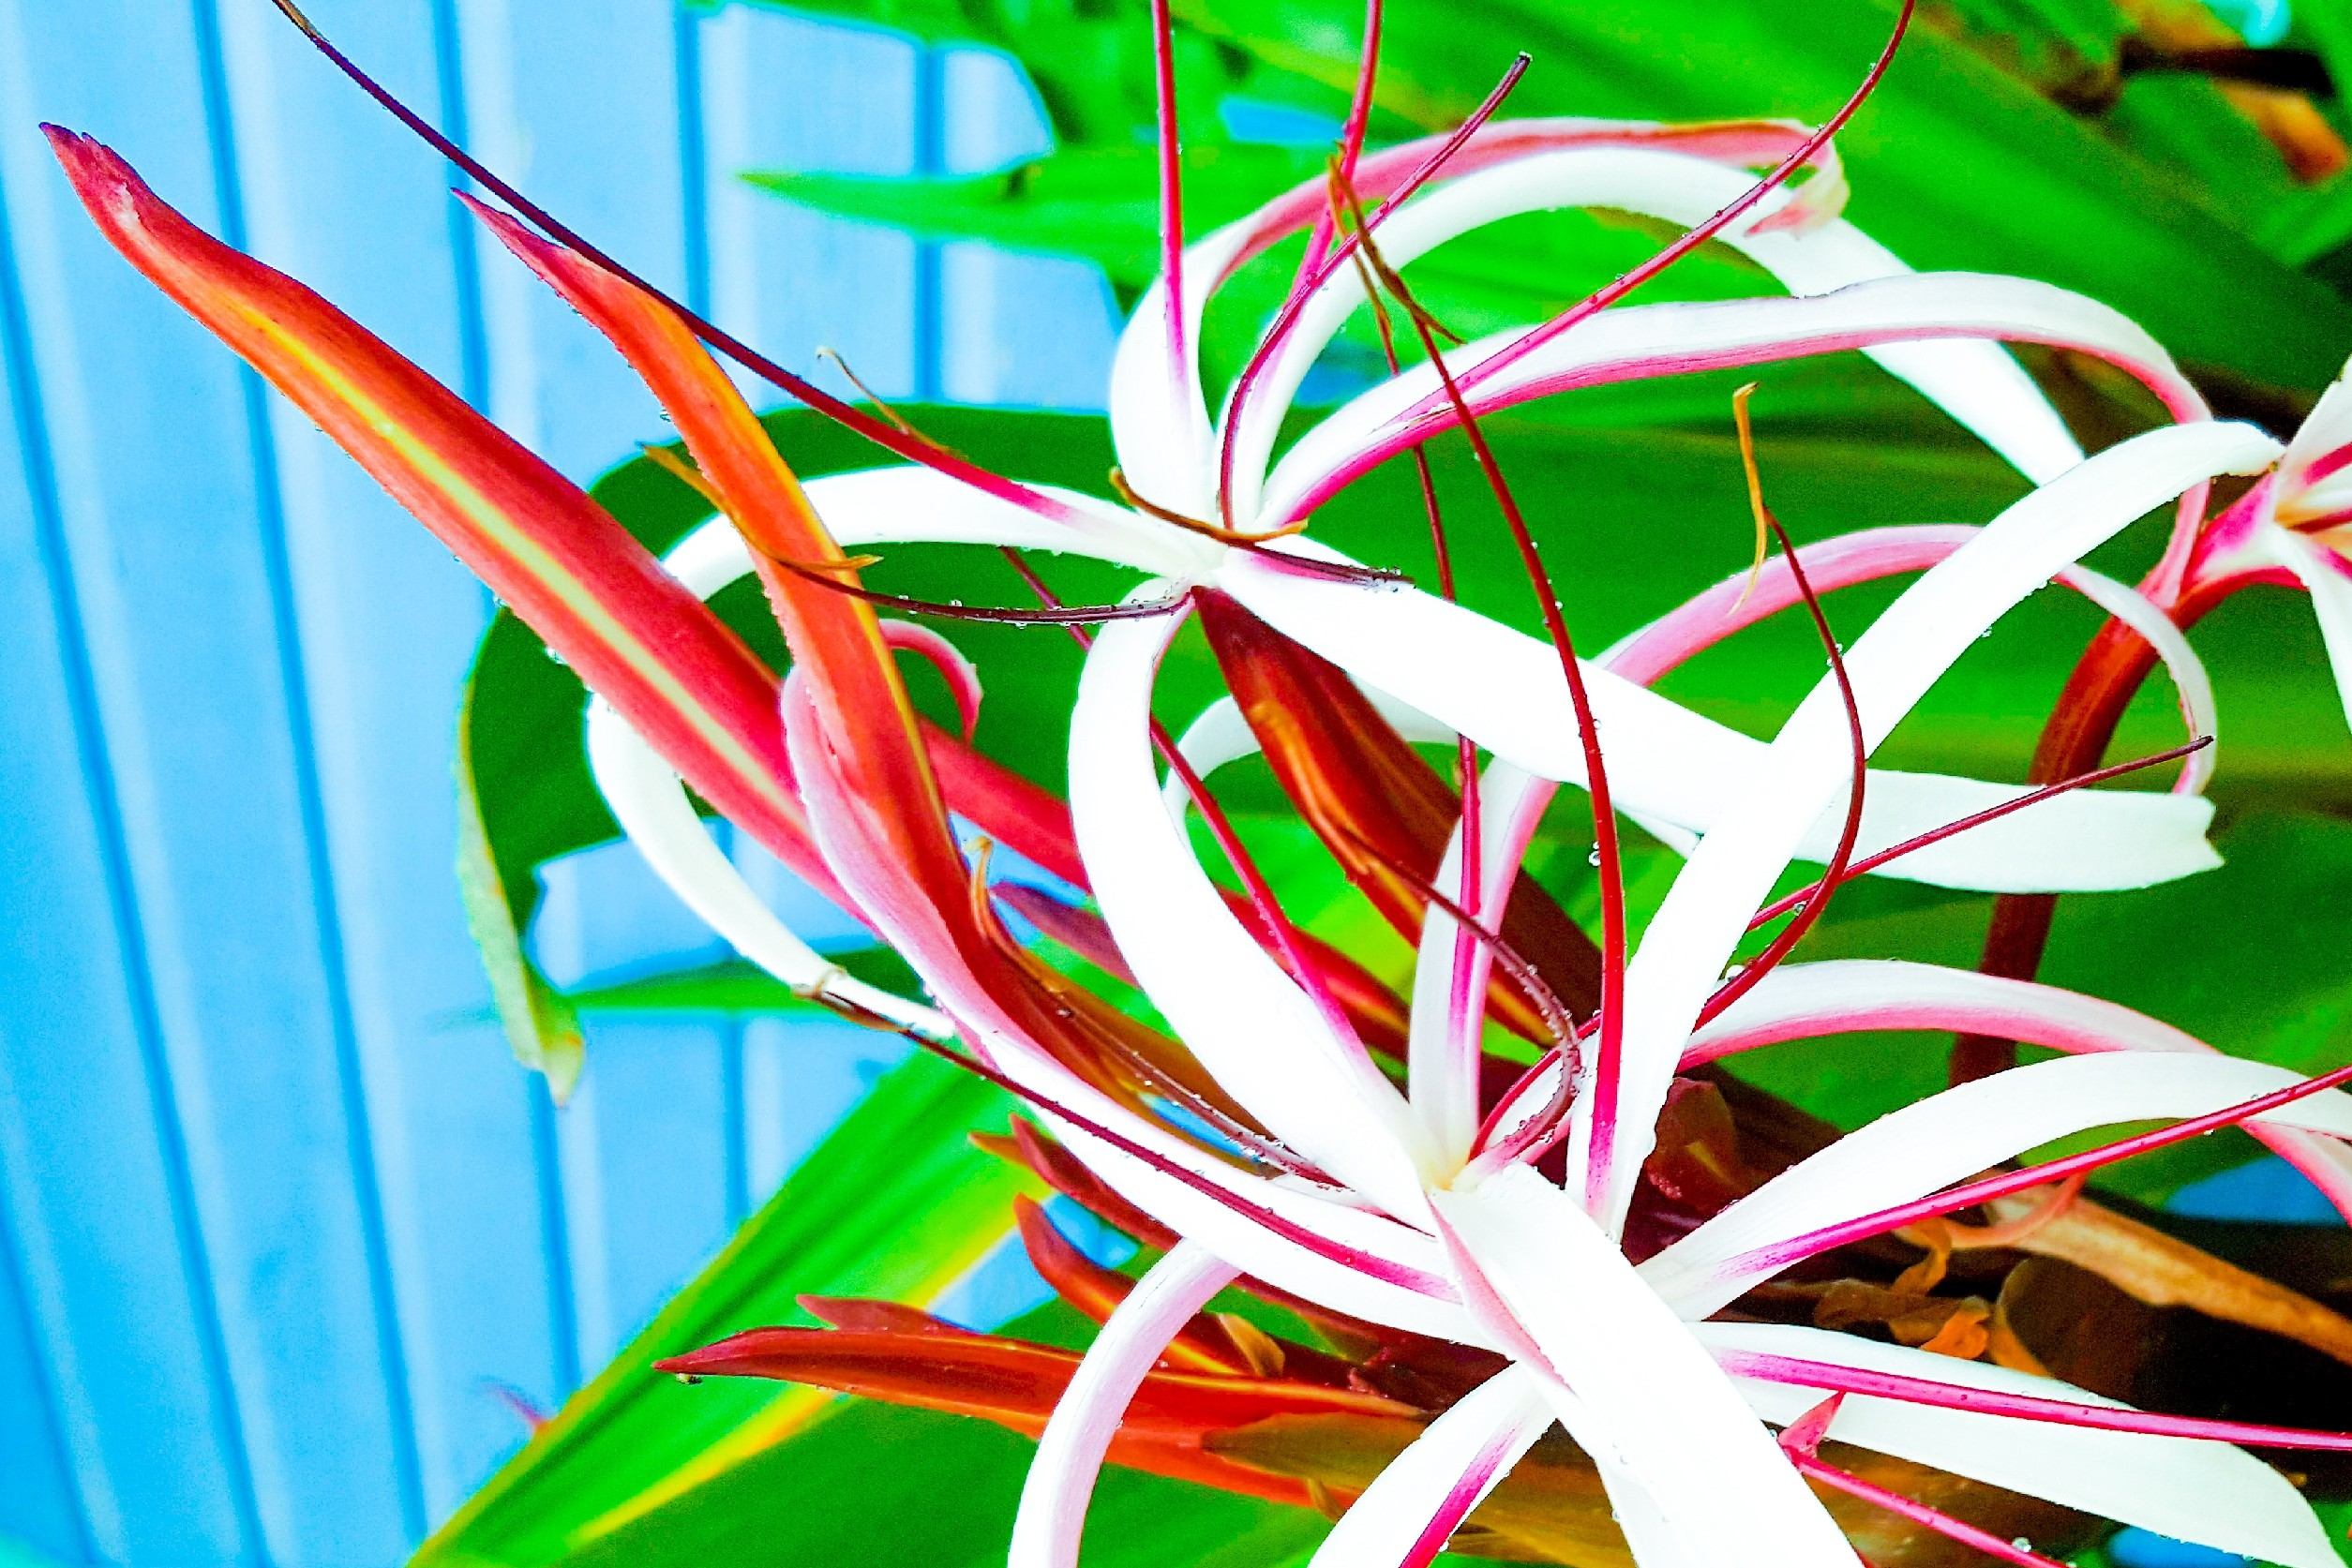 Floral pictures taken in Central America Adobe_20190310_100841Adobe_20190310_101144LRM_EXPORT_379961